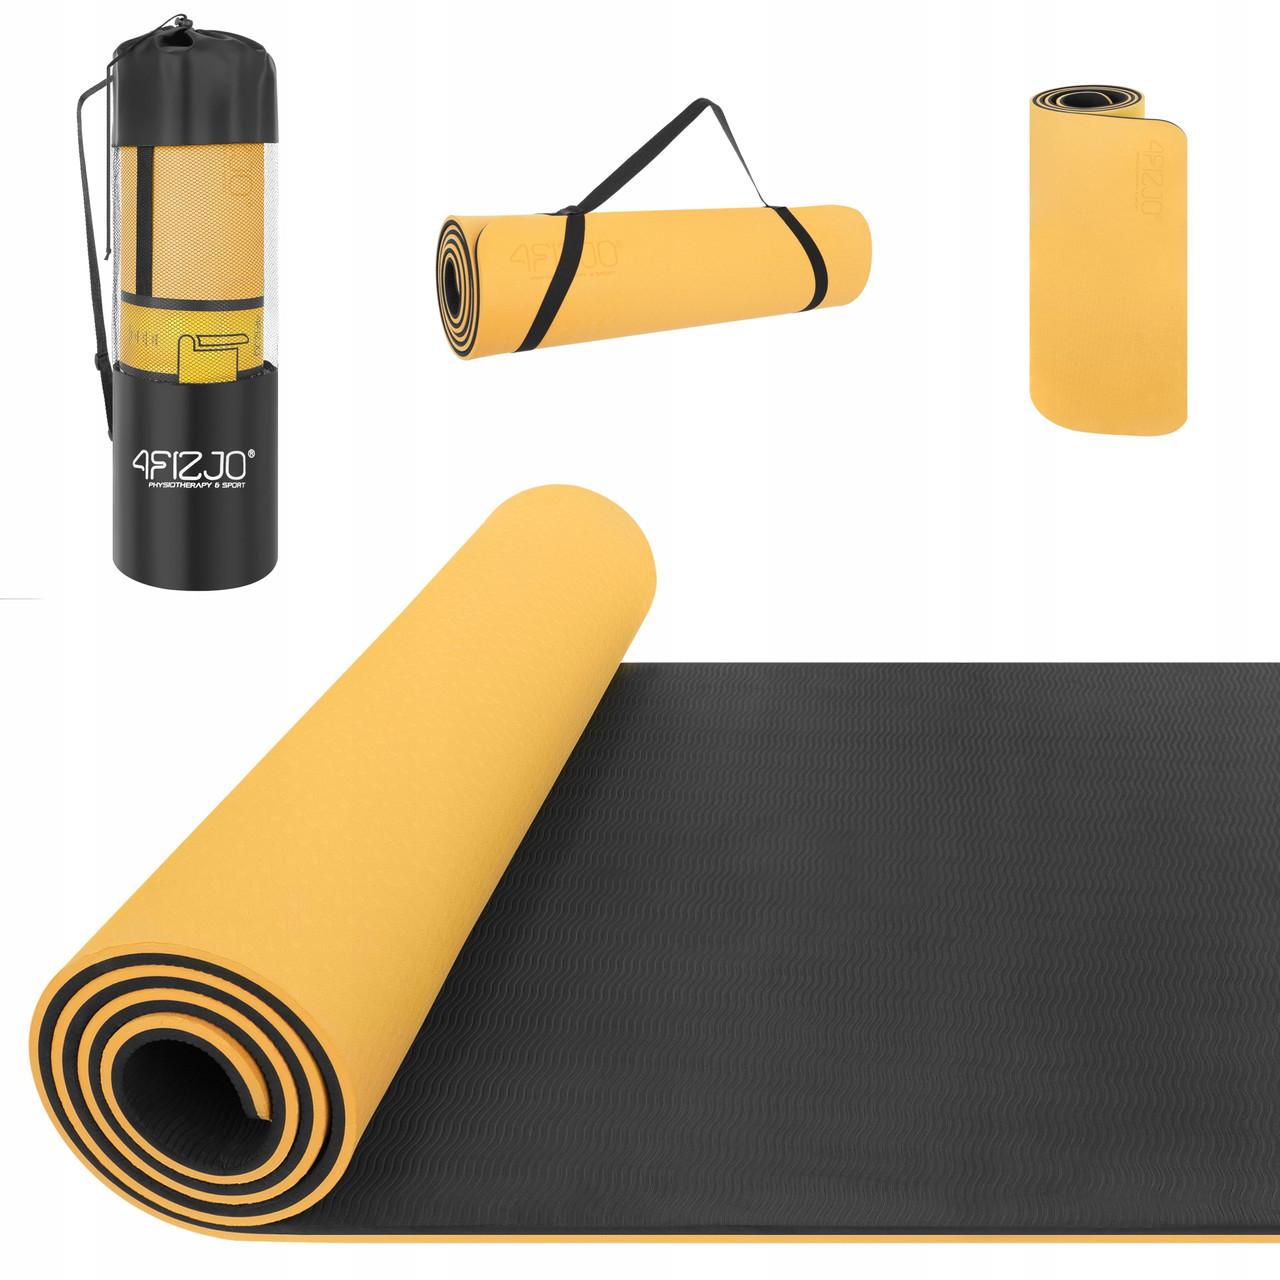 Коврик (мат) для йоги и фитнеса 4FIZJO TPE 1 см 4FJ0201 Orange/Black